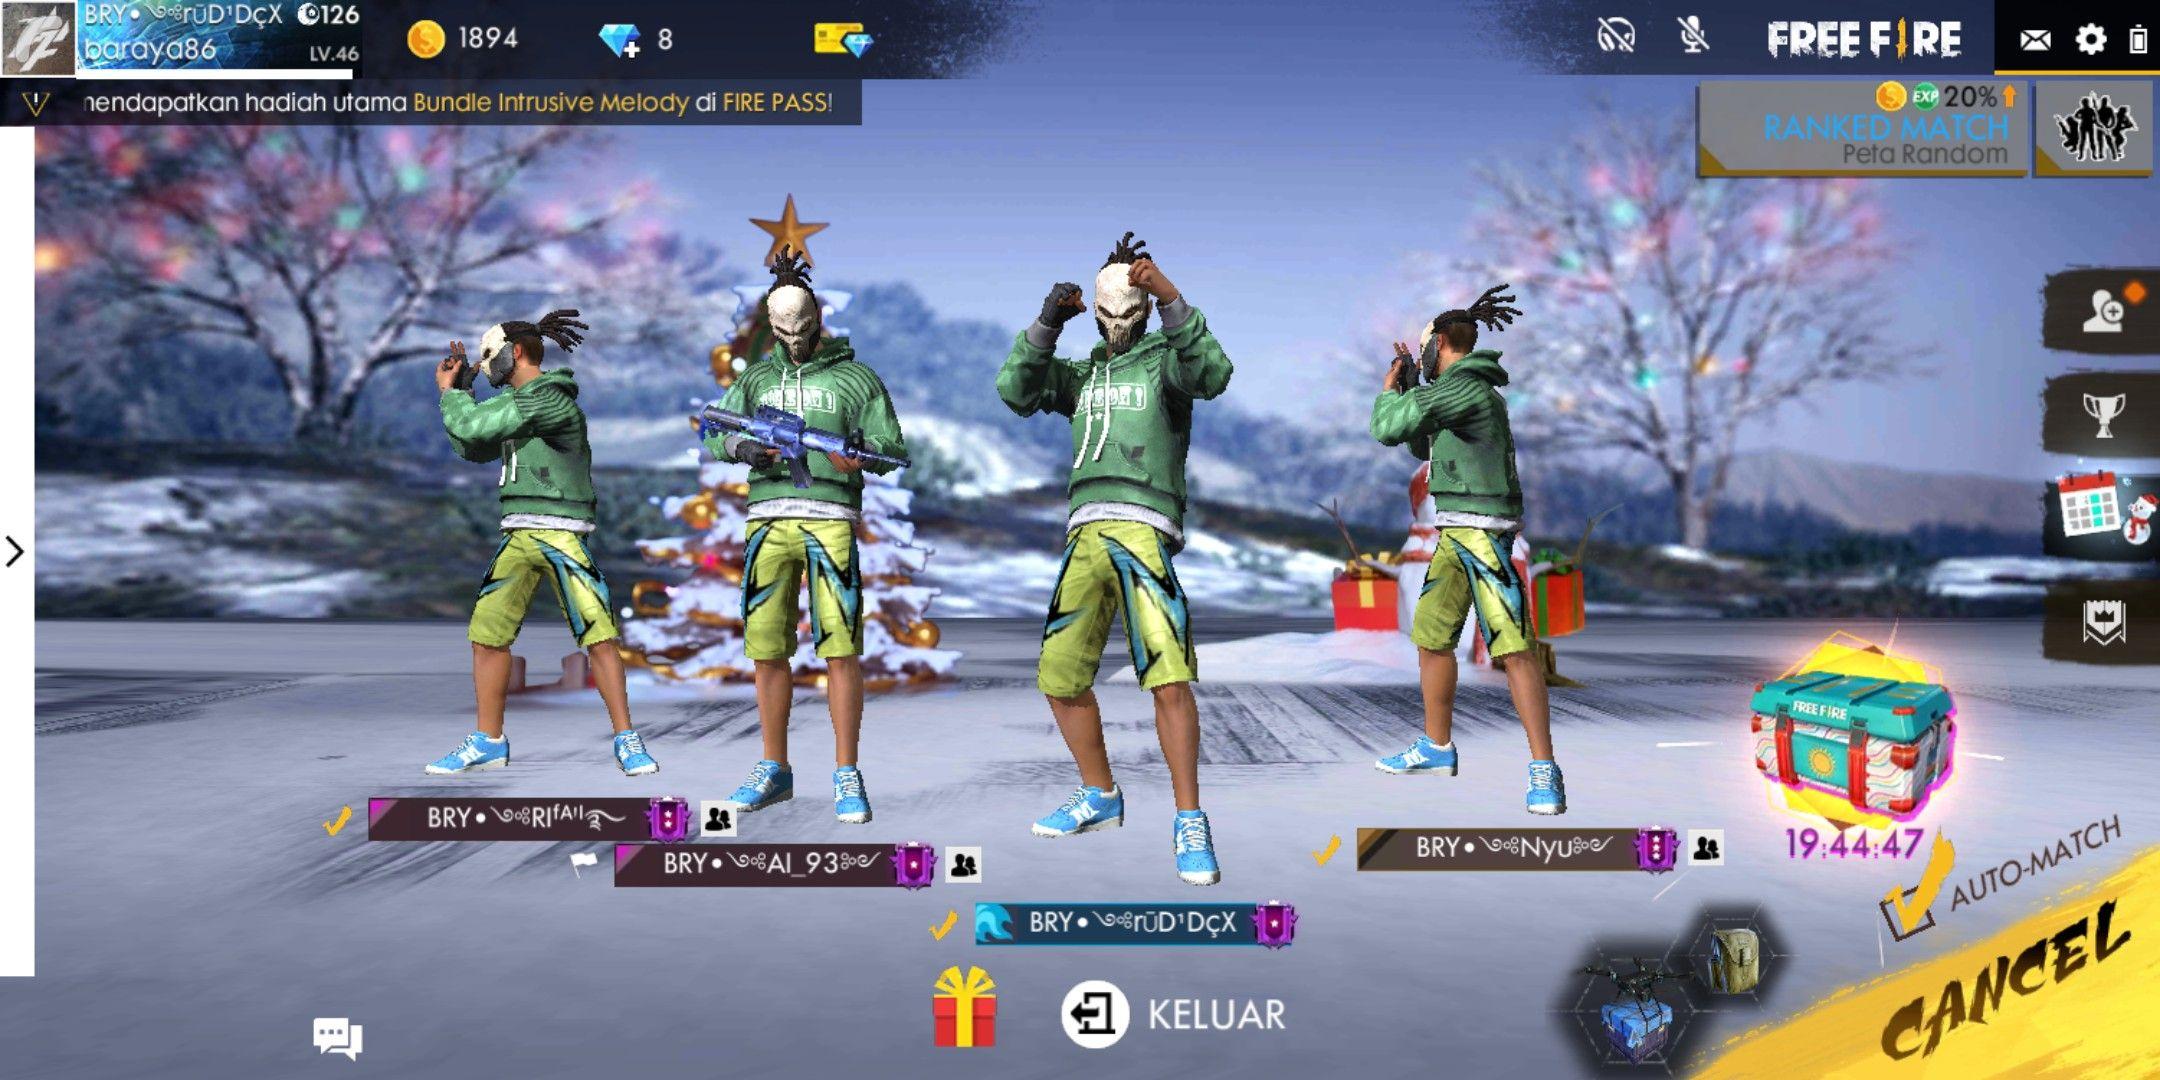 Bry Squad Freefireindonesia Freefire Booyah Pubg Garena